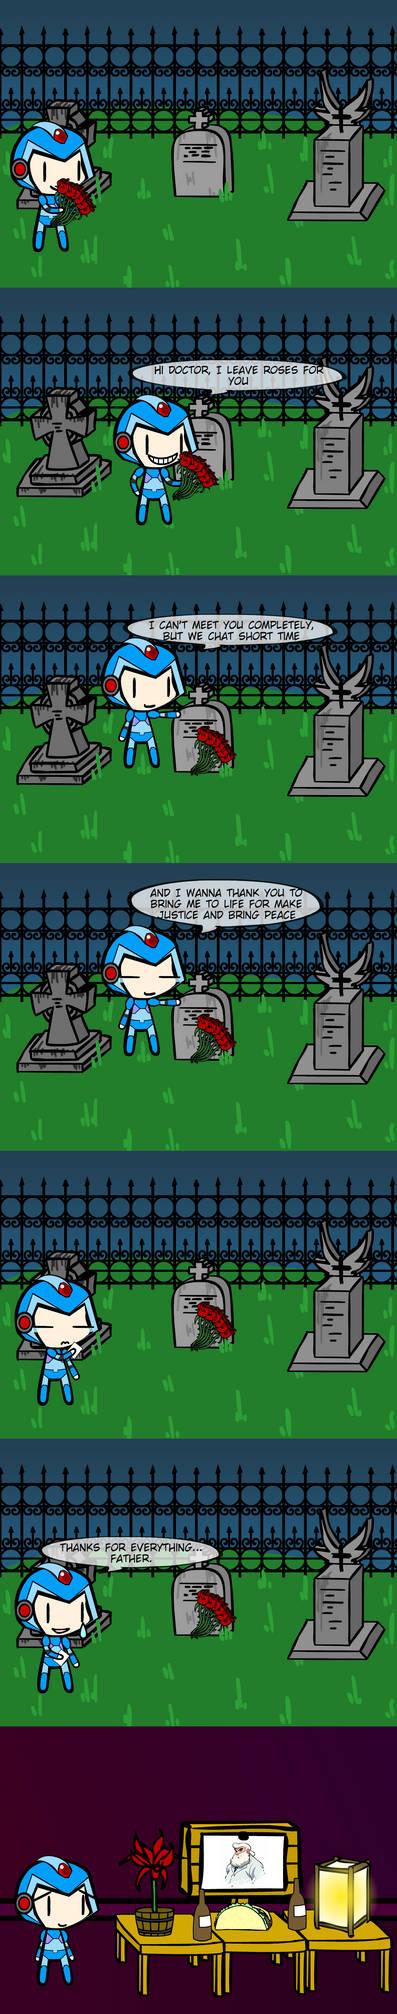 (Walfas comic) X commemorate Dia de muertos